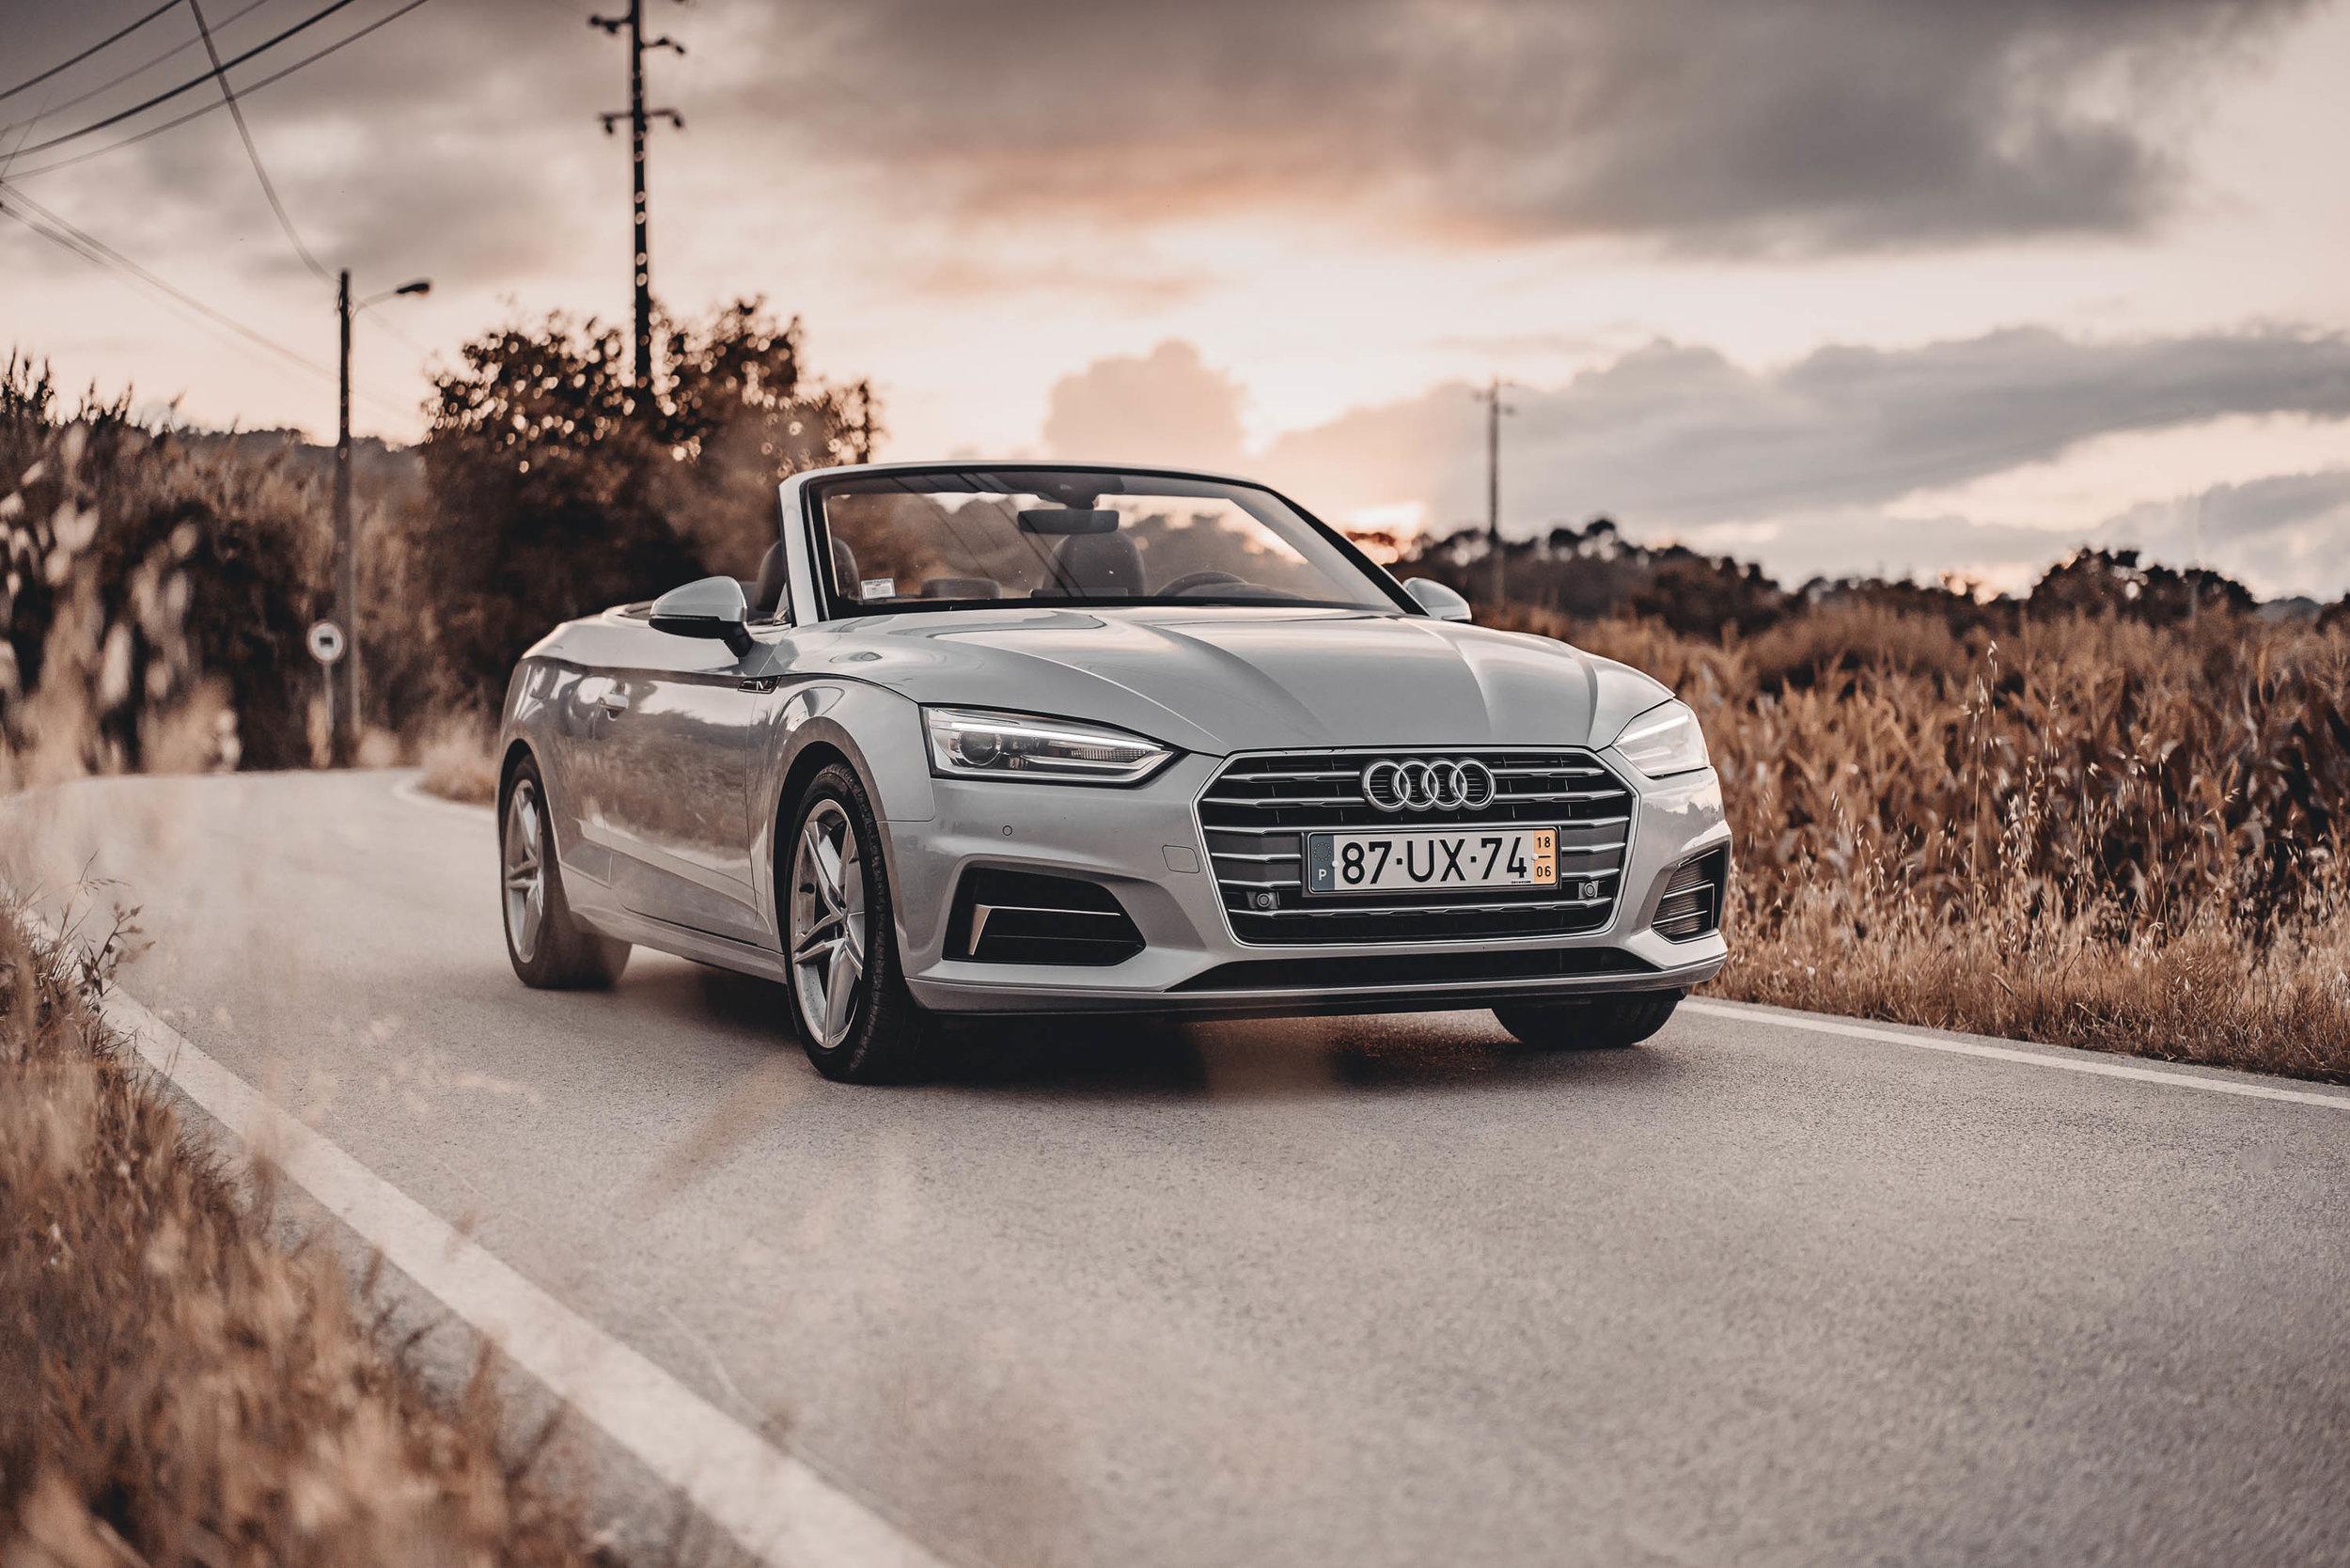 Maximilian_Otto_Audi_A5_Cabriolet_Portugal_19_WEB.jpg